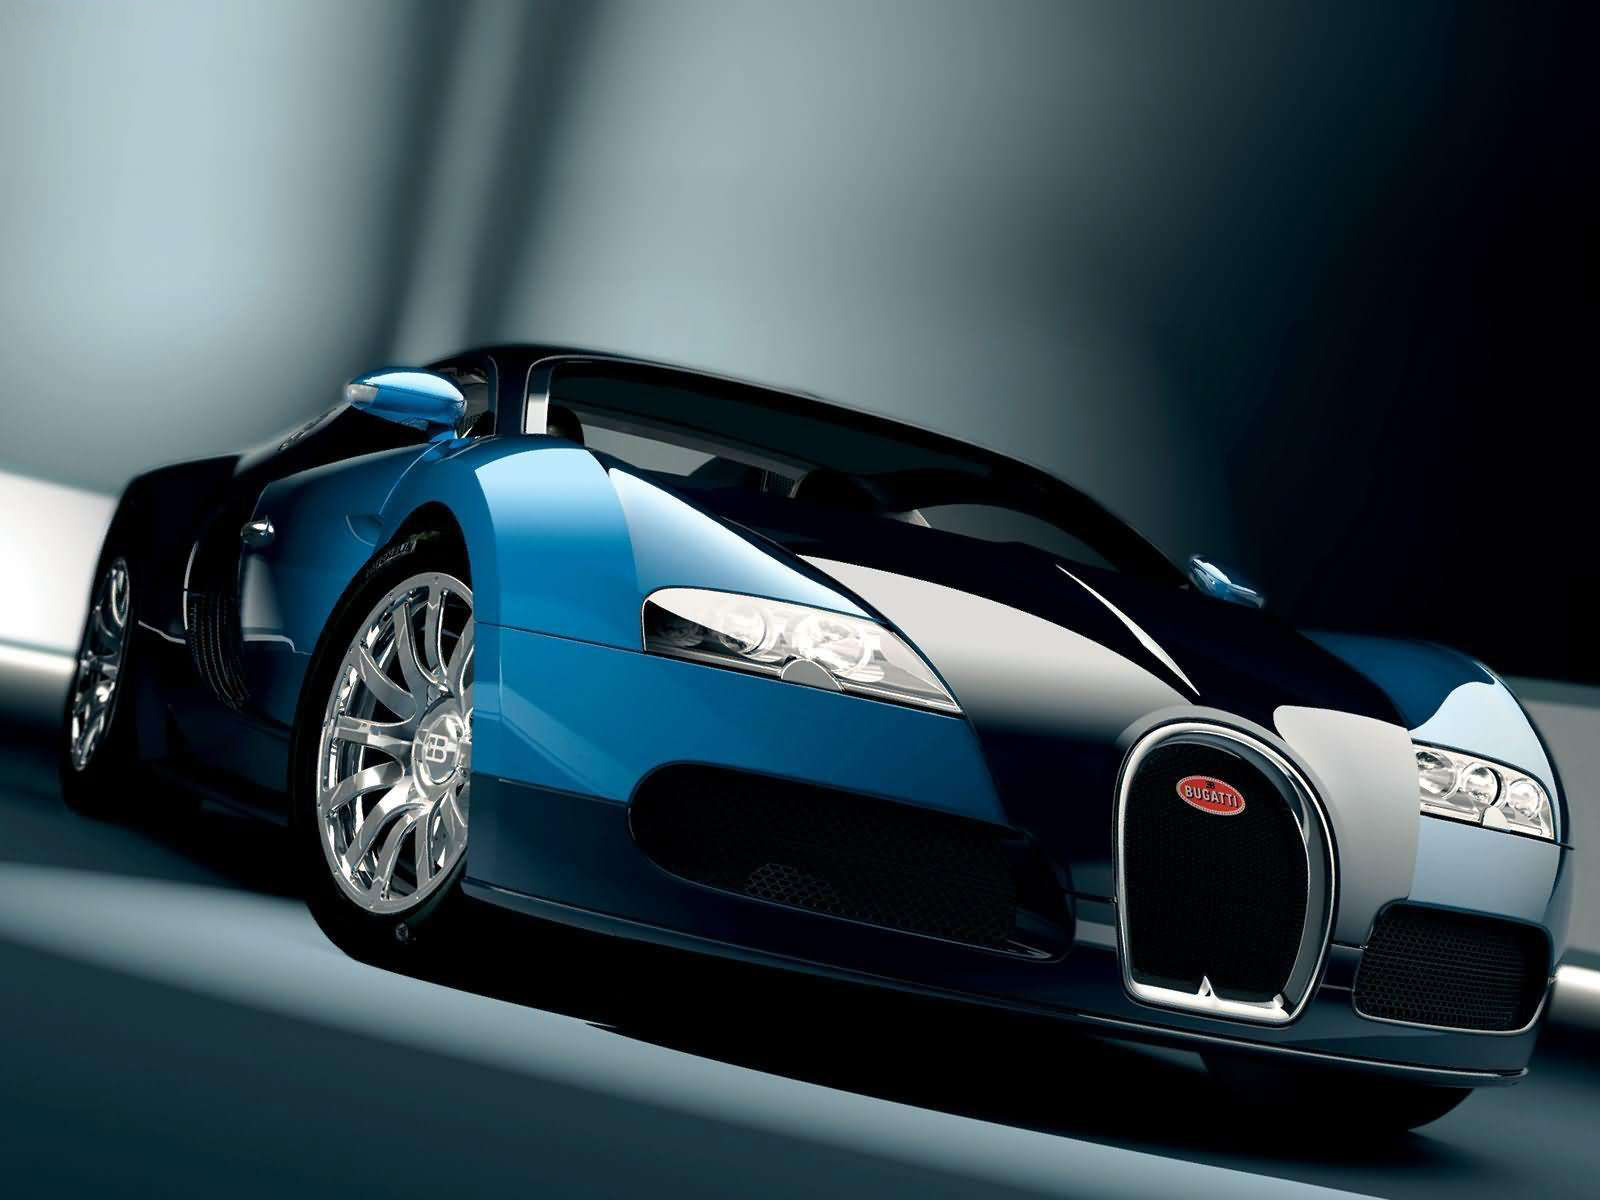 Mazda Raceway Laguna Seca >> Bugatti EB 164 Veyron (2004) - Auto Cars Concept